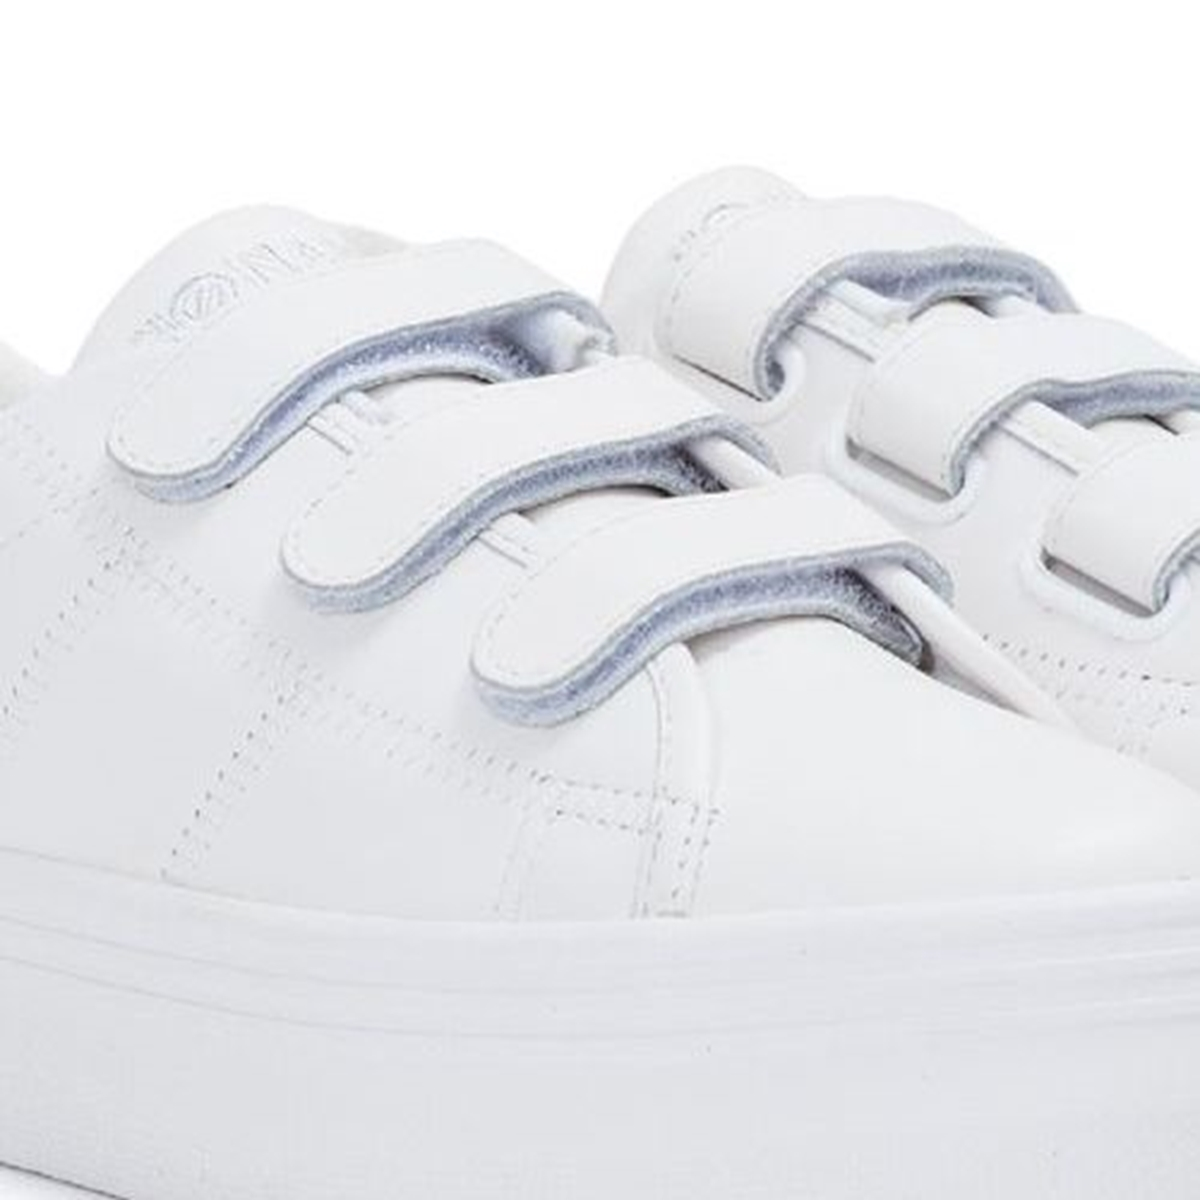 PLATO-11250-WHITE プラト ホワイト